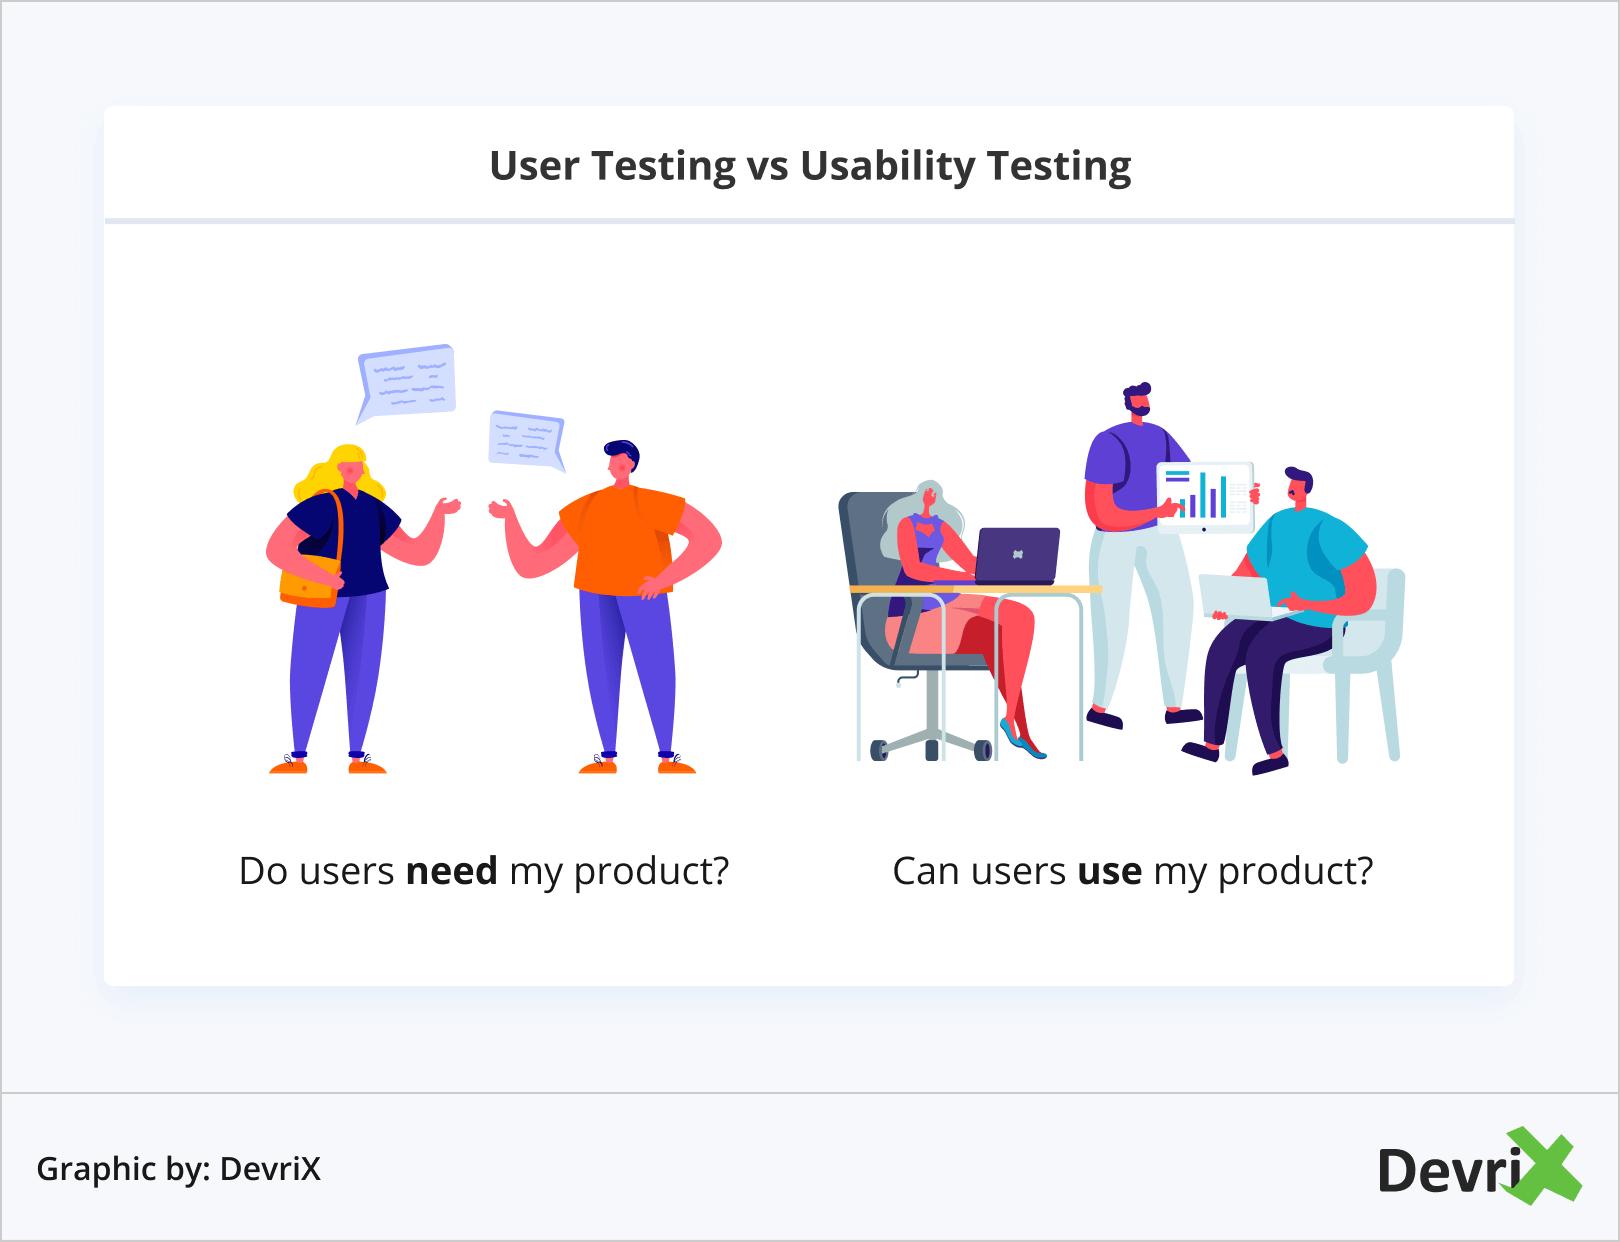 User Testing vs Usability Testing